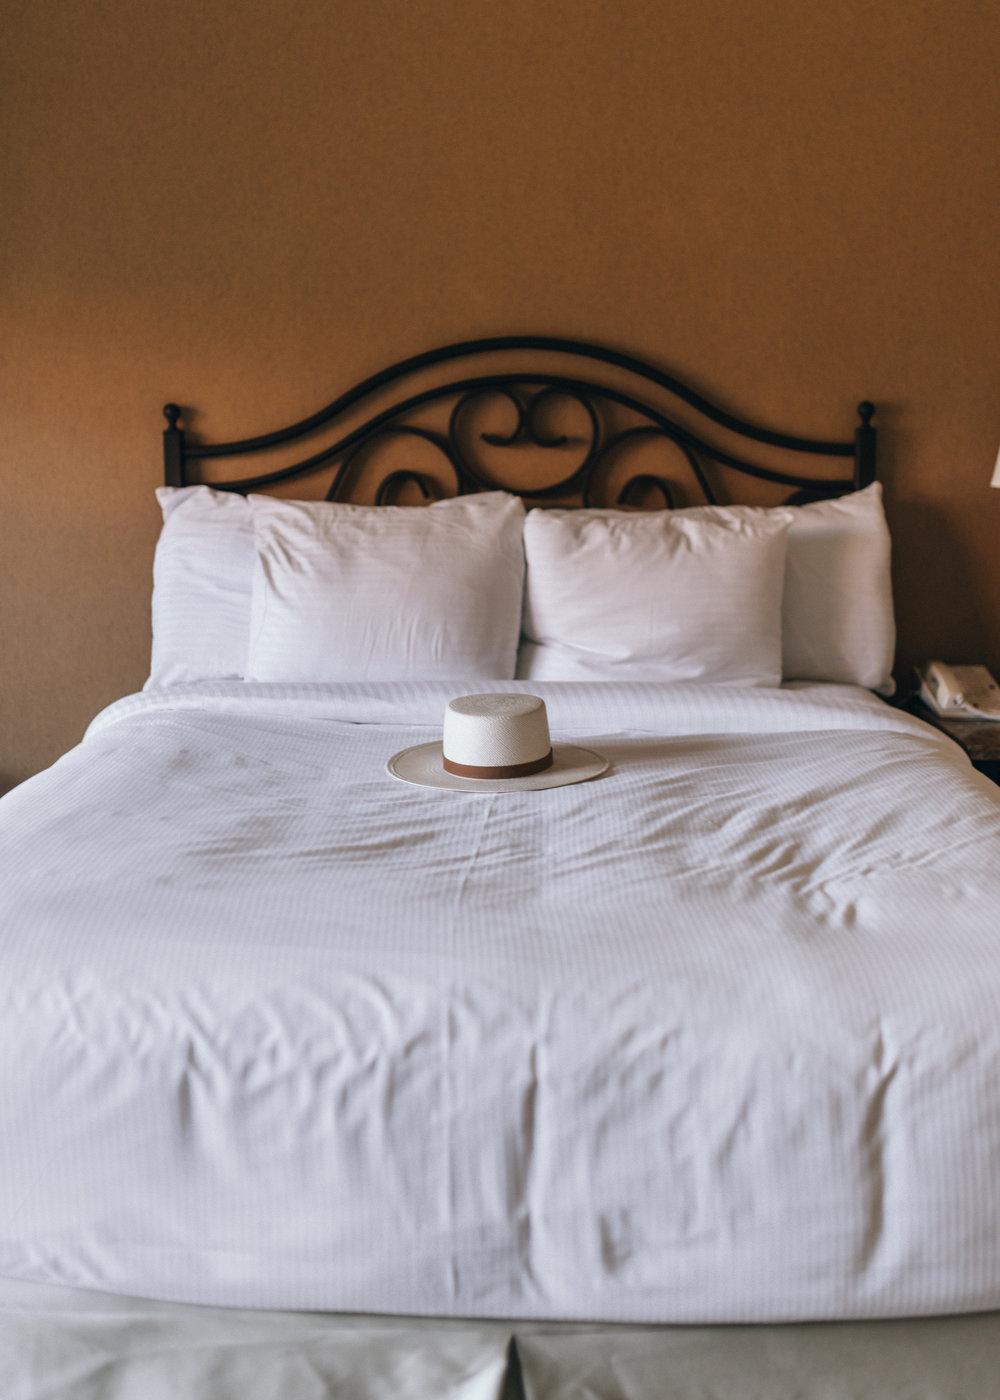 miramonte-resort-spa-by-lisa-linh